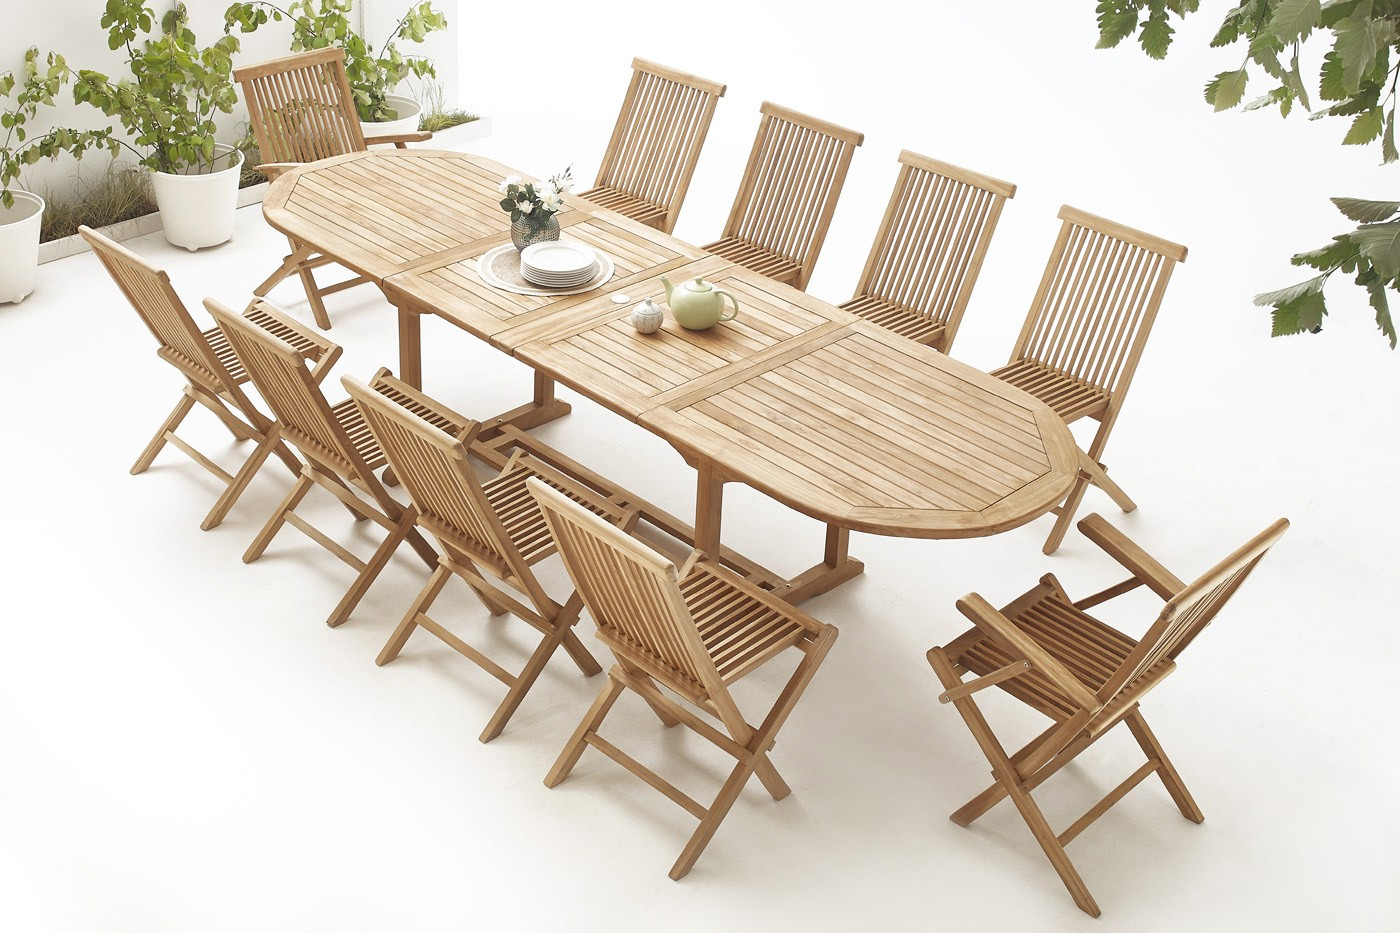 Table ovale 8 chaises 2 fauteuils teck brut massif for Table exterieur teck massif